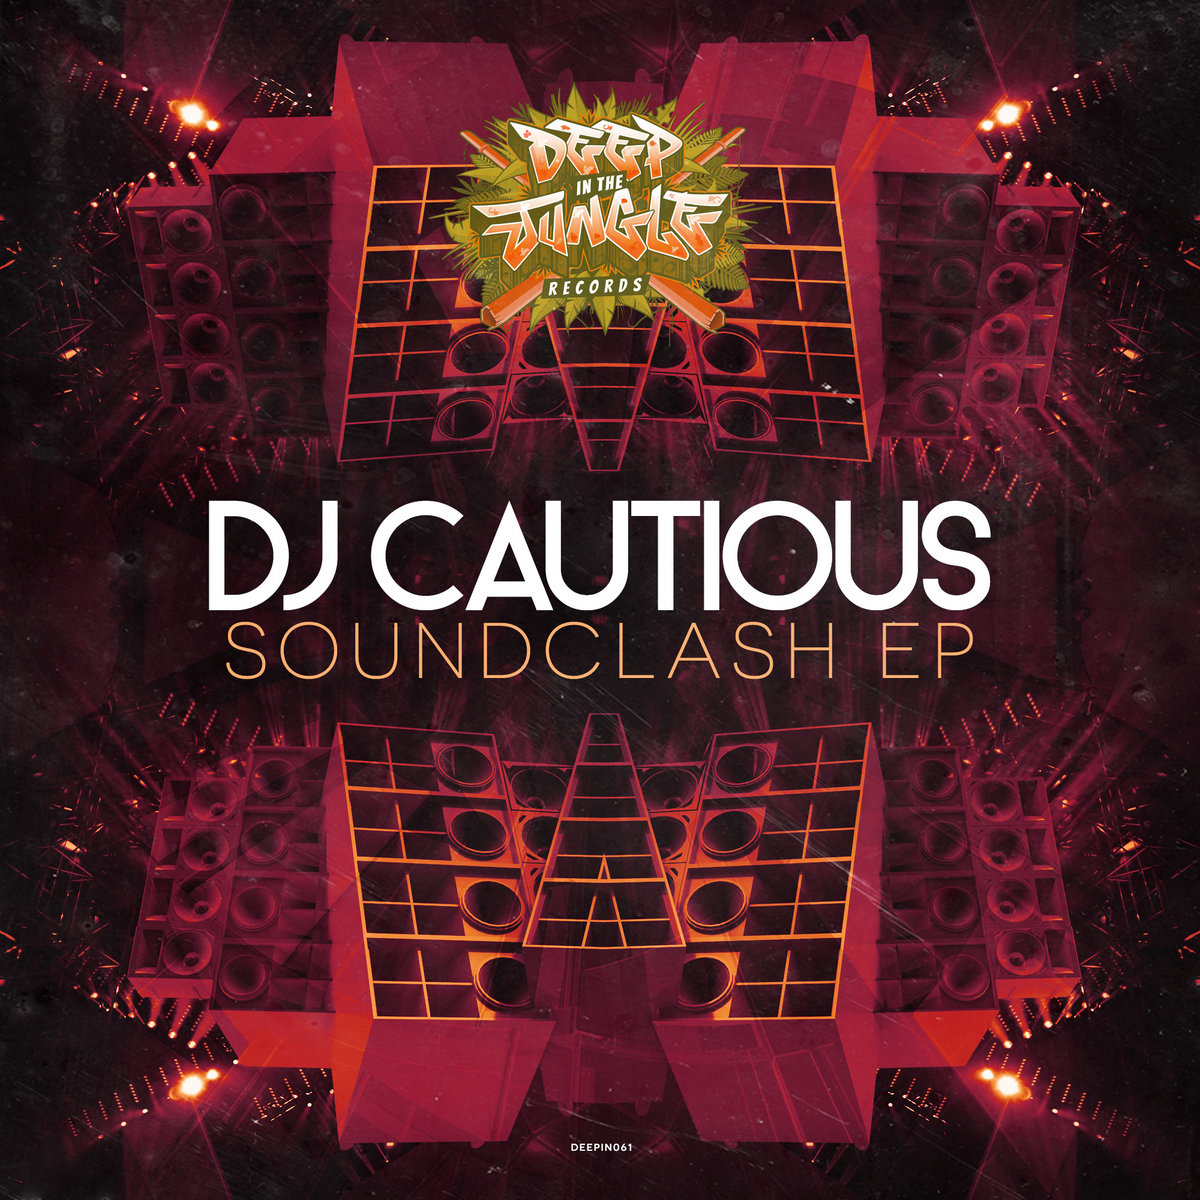 DEEPIN061 - DJ Cautious - Soundclash EP | Deep in The Jungle Records